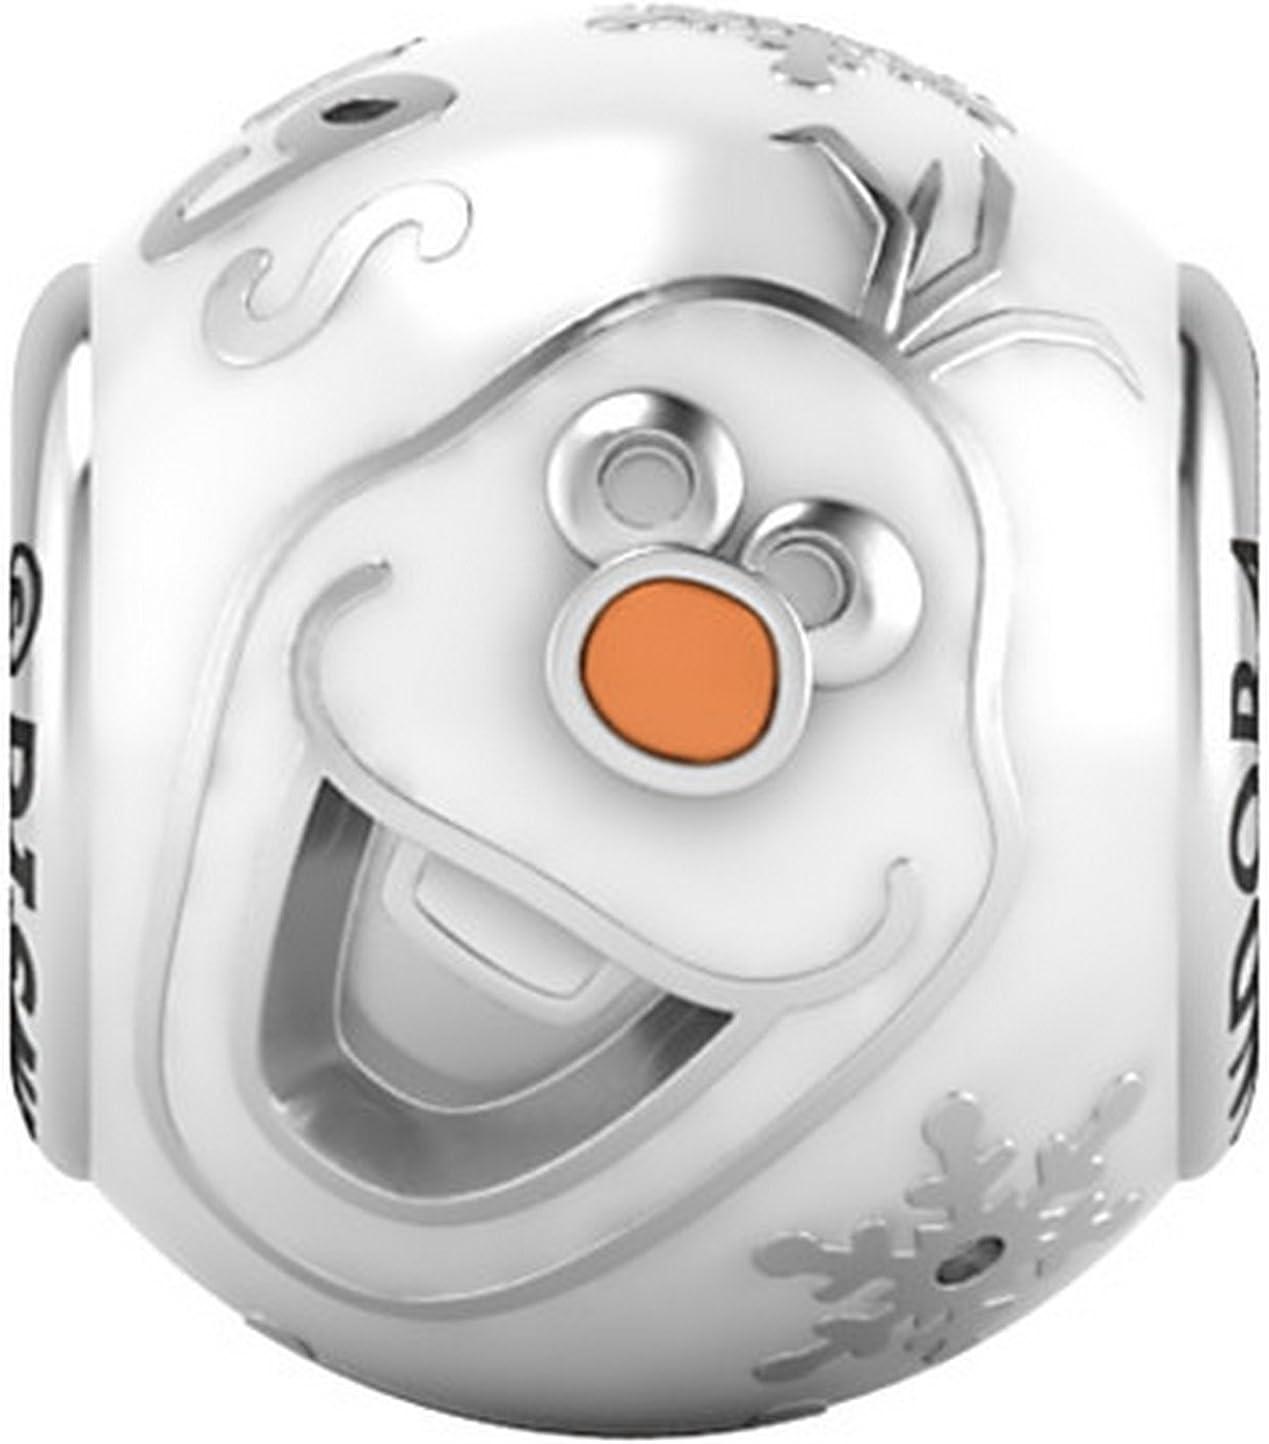 Pandora Disney Olaf Quot;I Like Warm Hugs en émail Blanc Perle ...